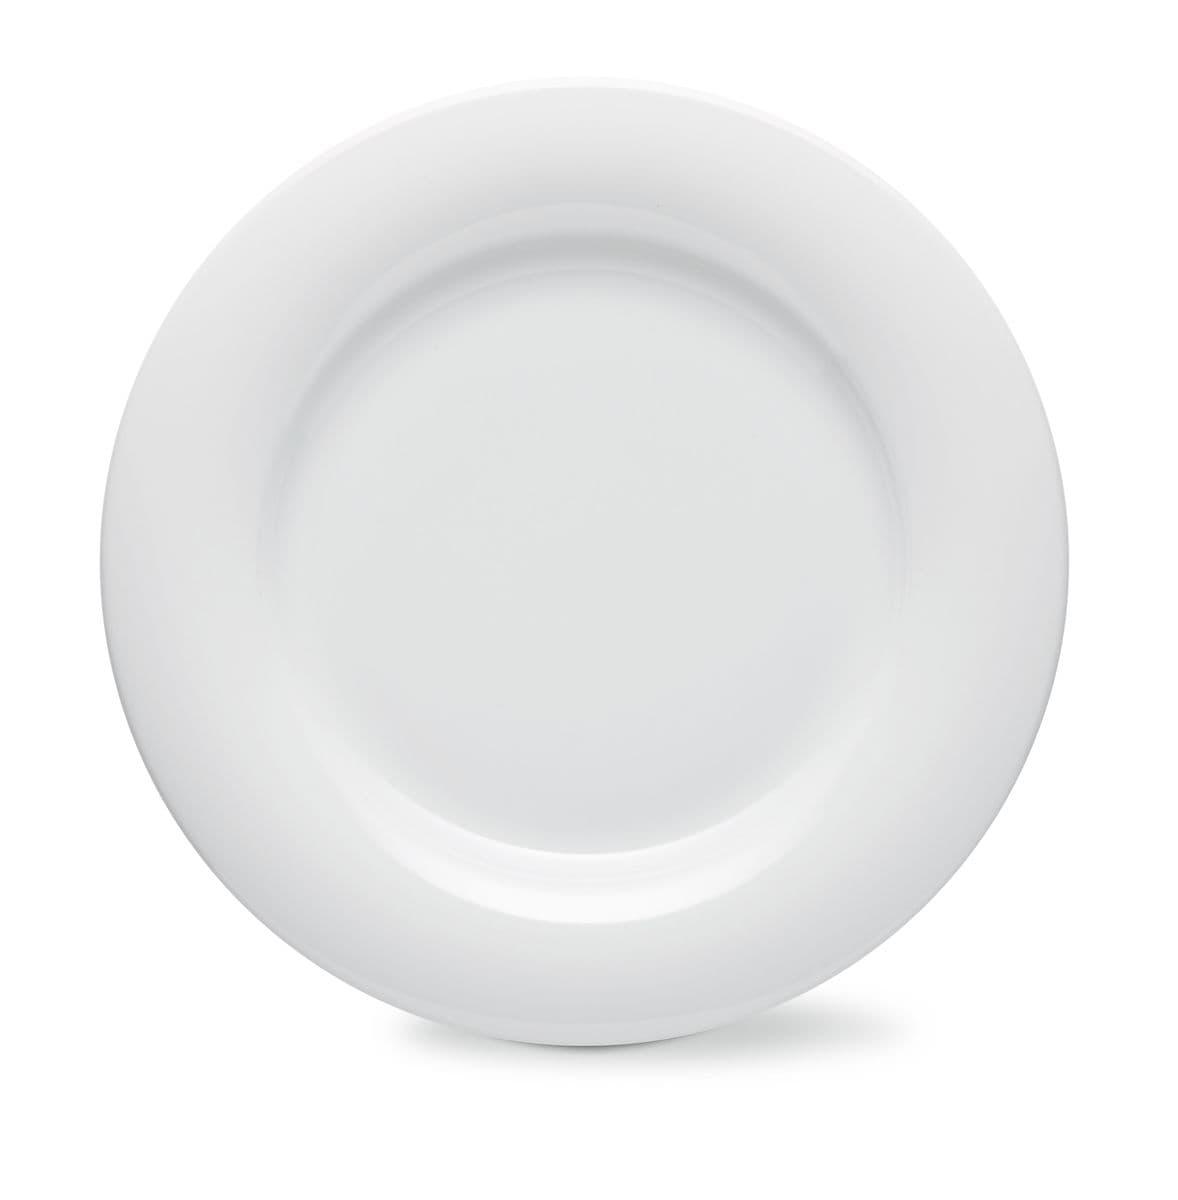 Cucina & Tavola COOL Teller 27.5cm